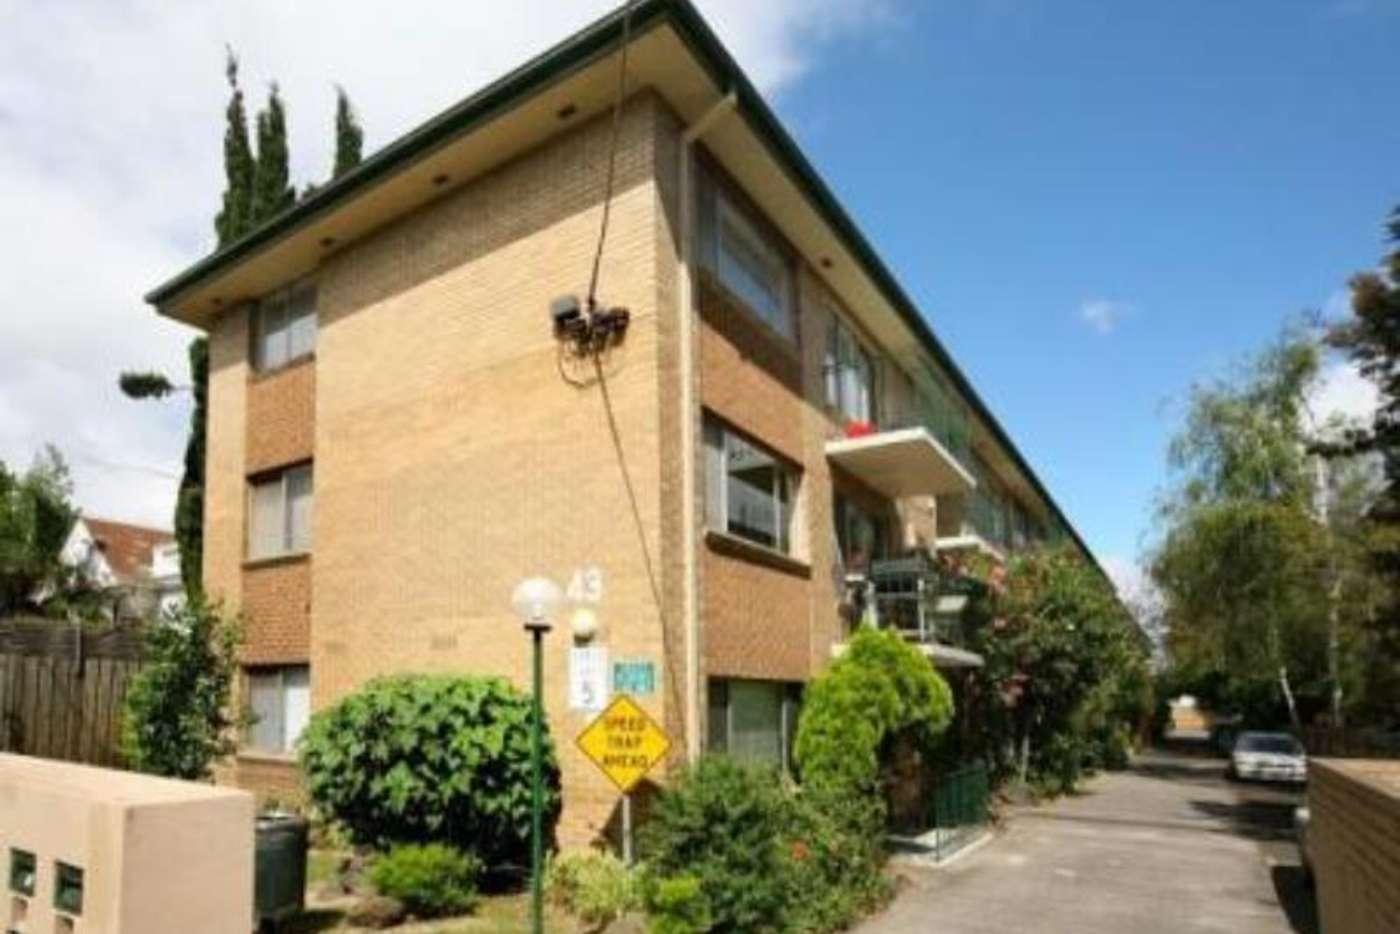 Main view of Homely apartment listing, 10/43 Williams Road, Prahran VIC 3181